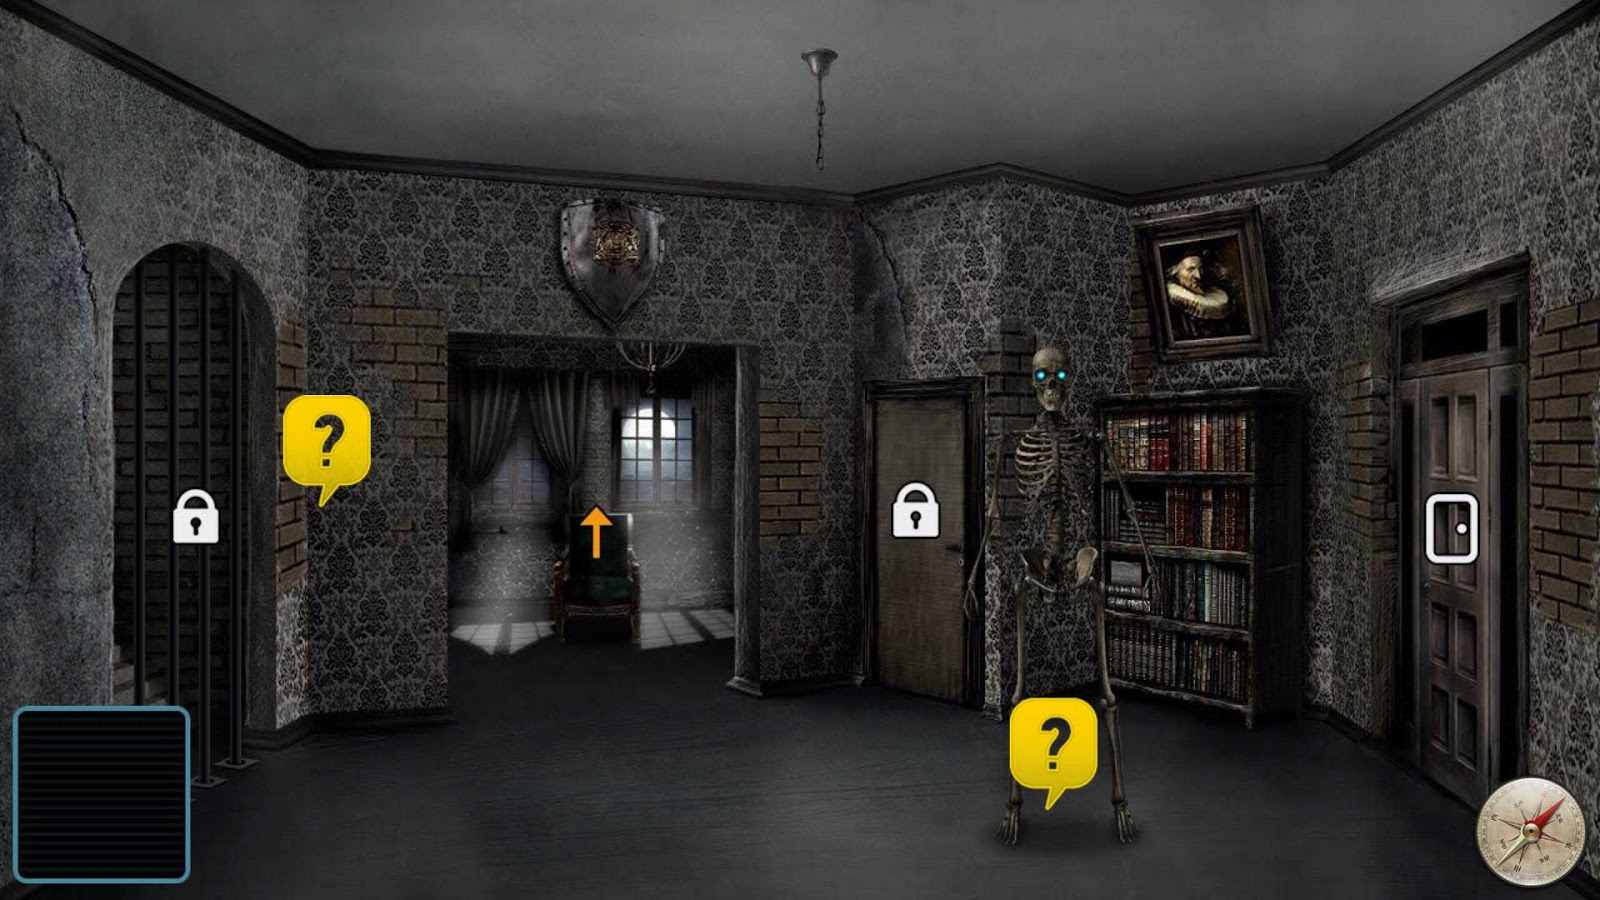 kapou test n 111 locks adventure escape game haguenau. Black Bedroom Furniture Sets. Home Design Ideas